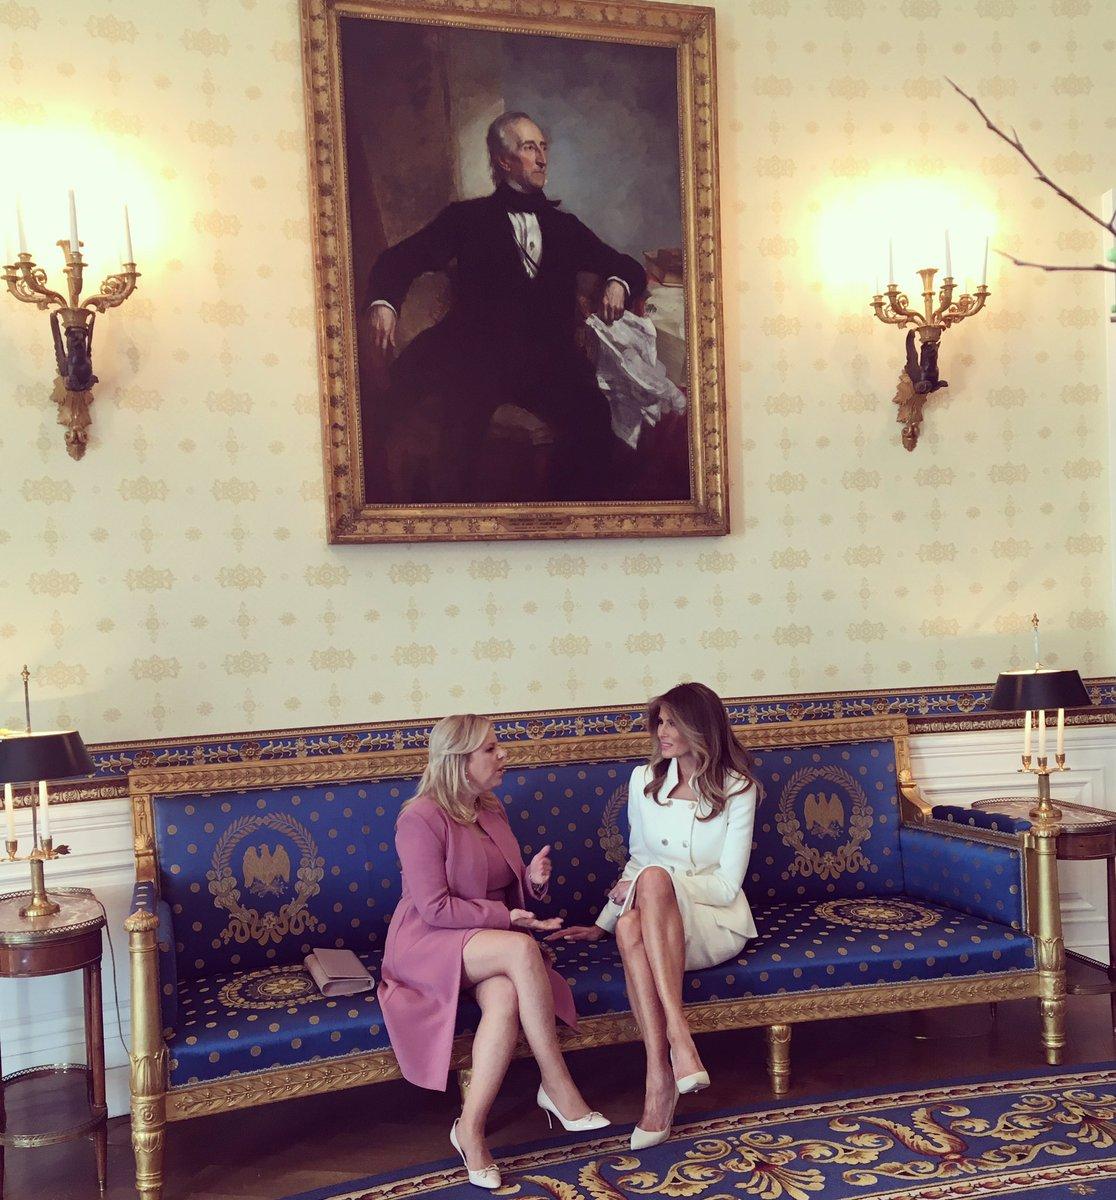 Thank you Mrs. Netanyahu for your friendship and dedication #PowerOfTheFirstLady https://t.co/IiUjtTglOu